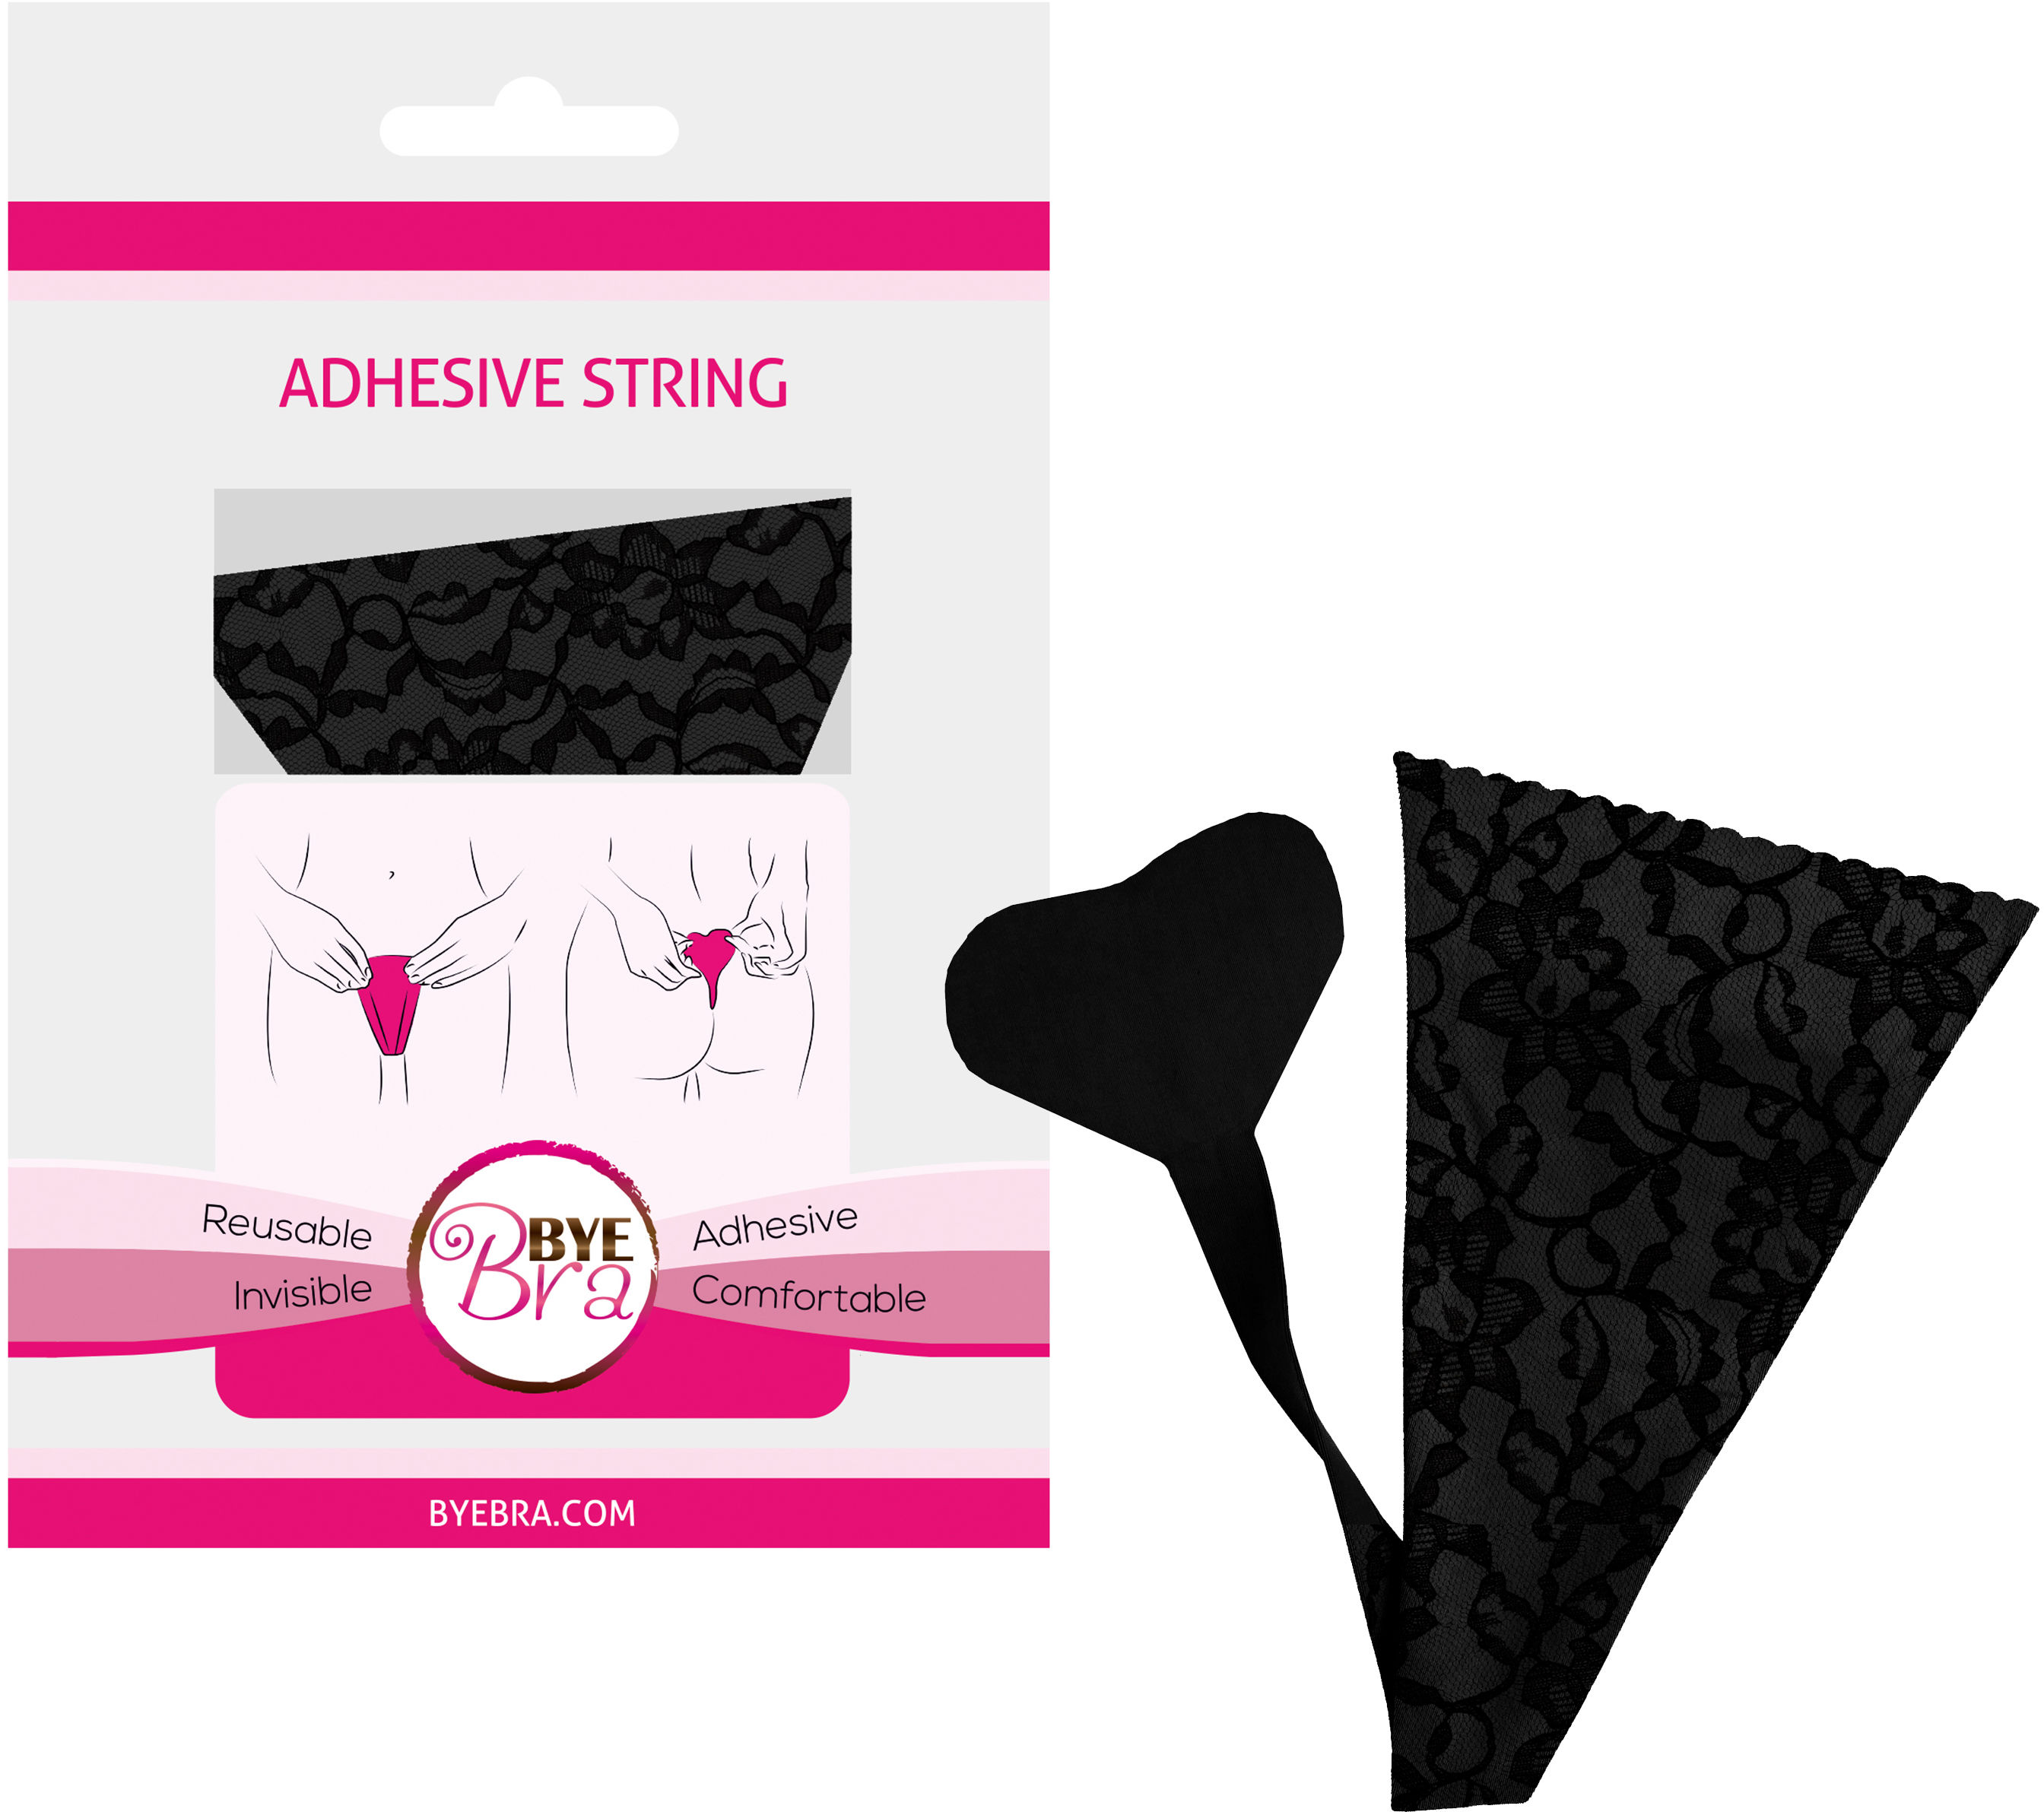 Bye Bra Adhesive String Lace Finish Black One Size